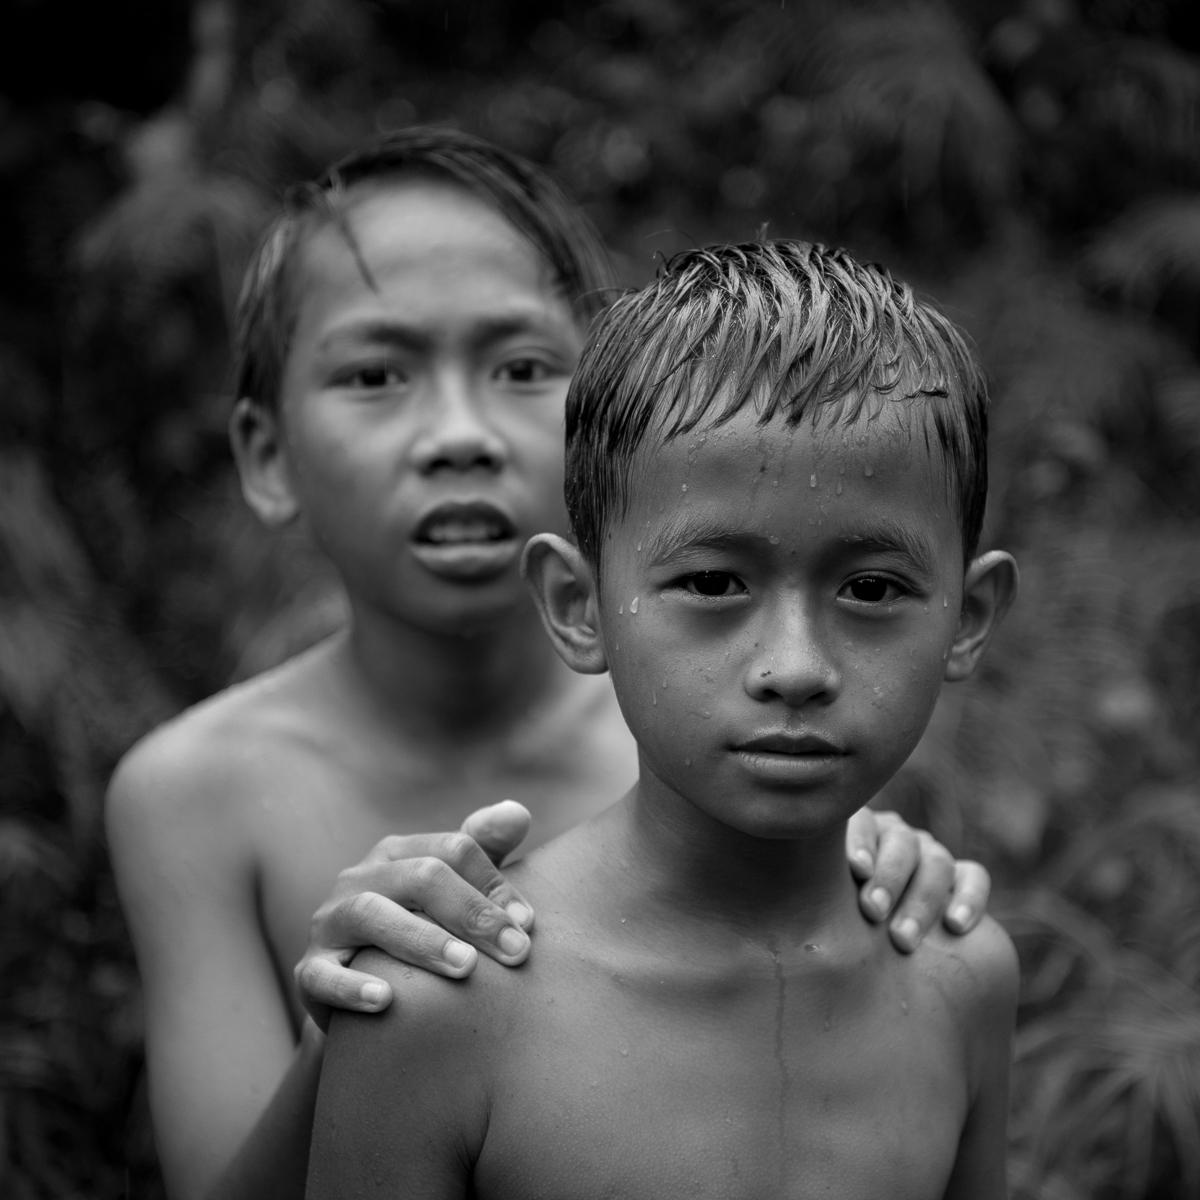 Best Child Portraits - Christopher Ryan